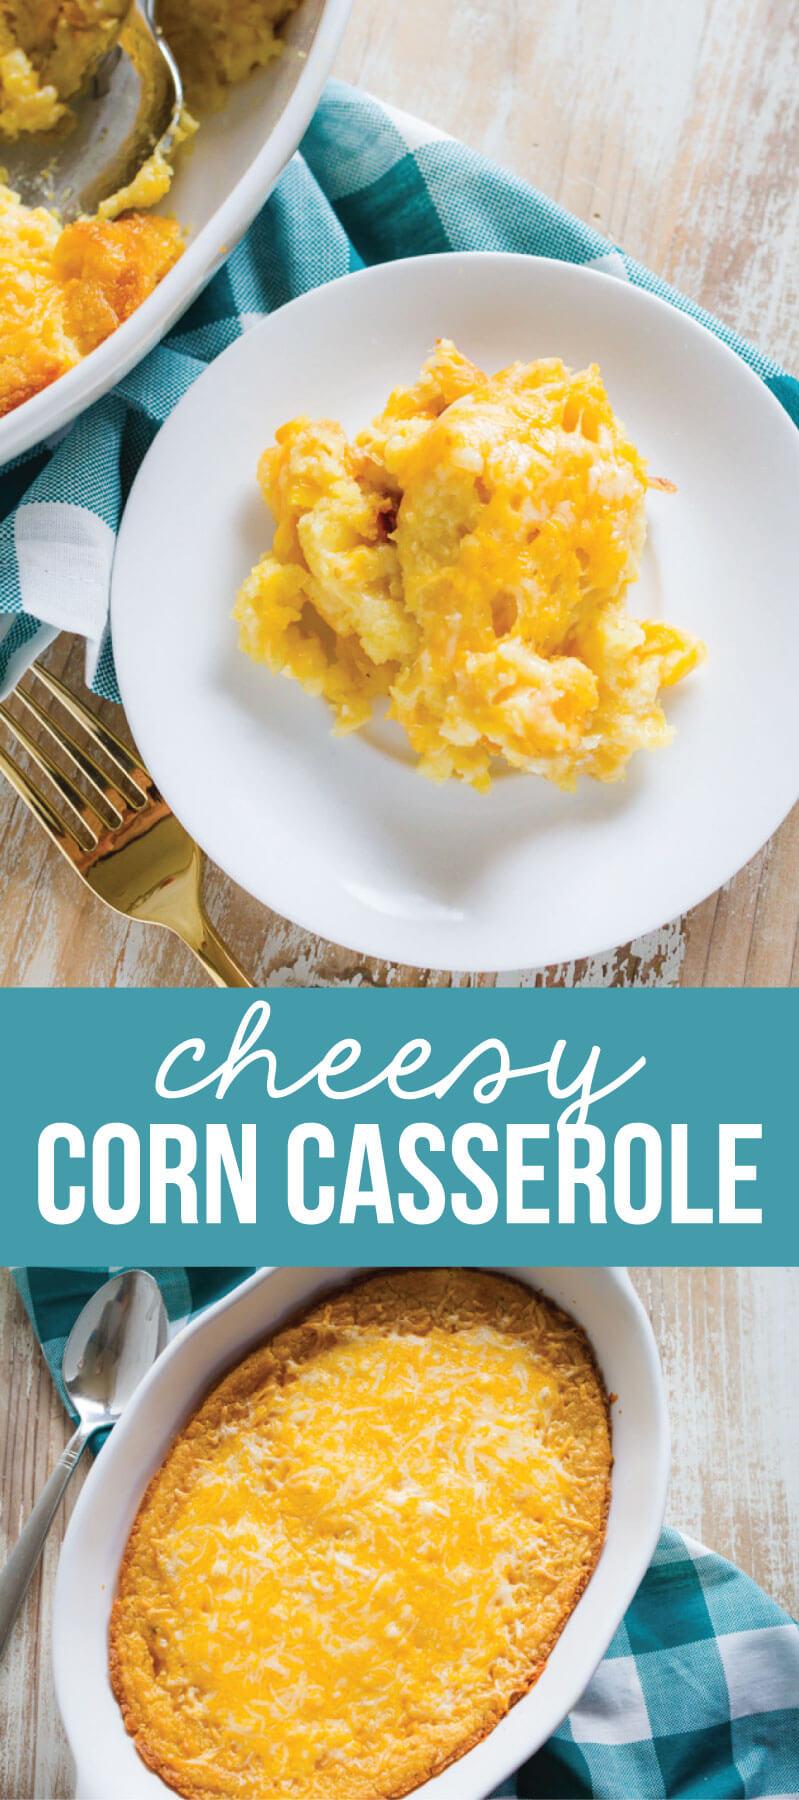 Cheesy Corn Casserole - a side dish recipe that everyone will love from www.thirtyhandmadedays.com